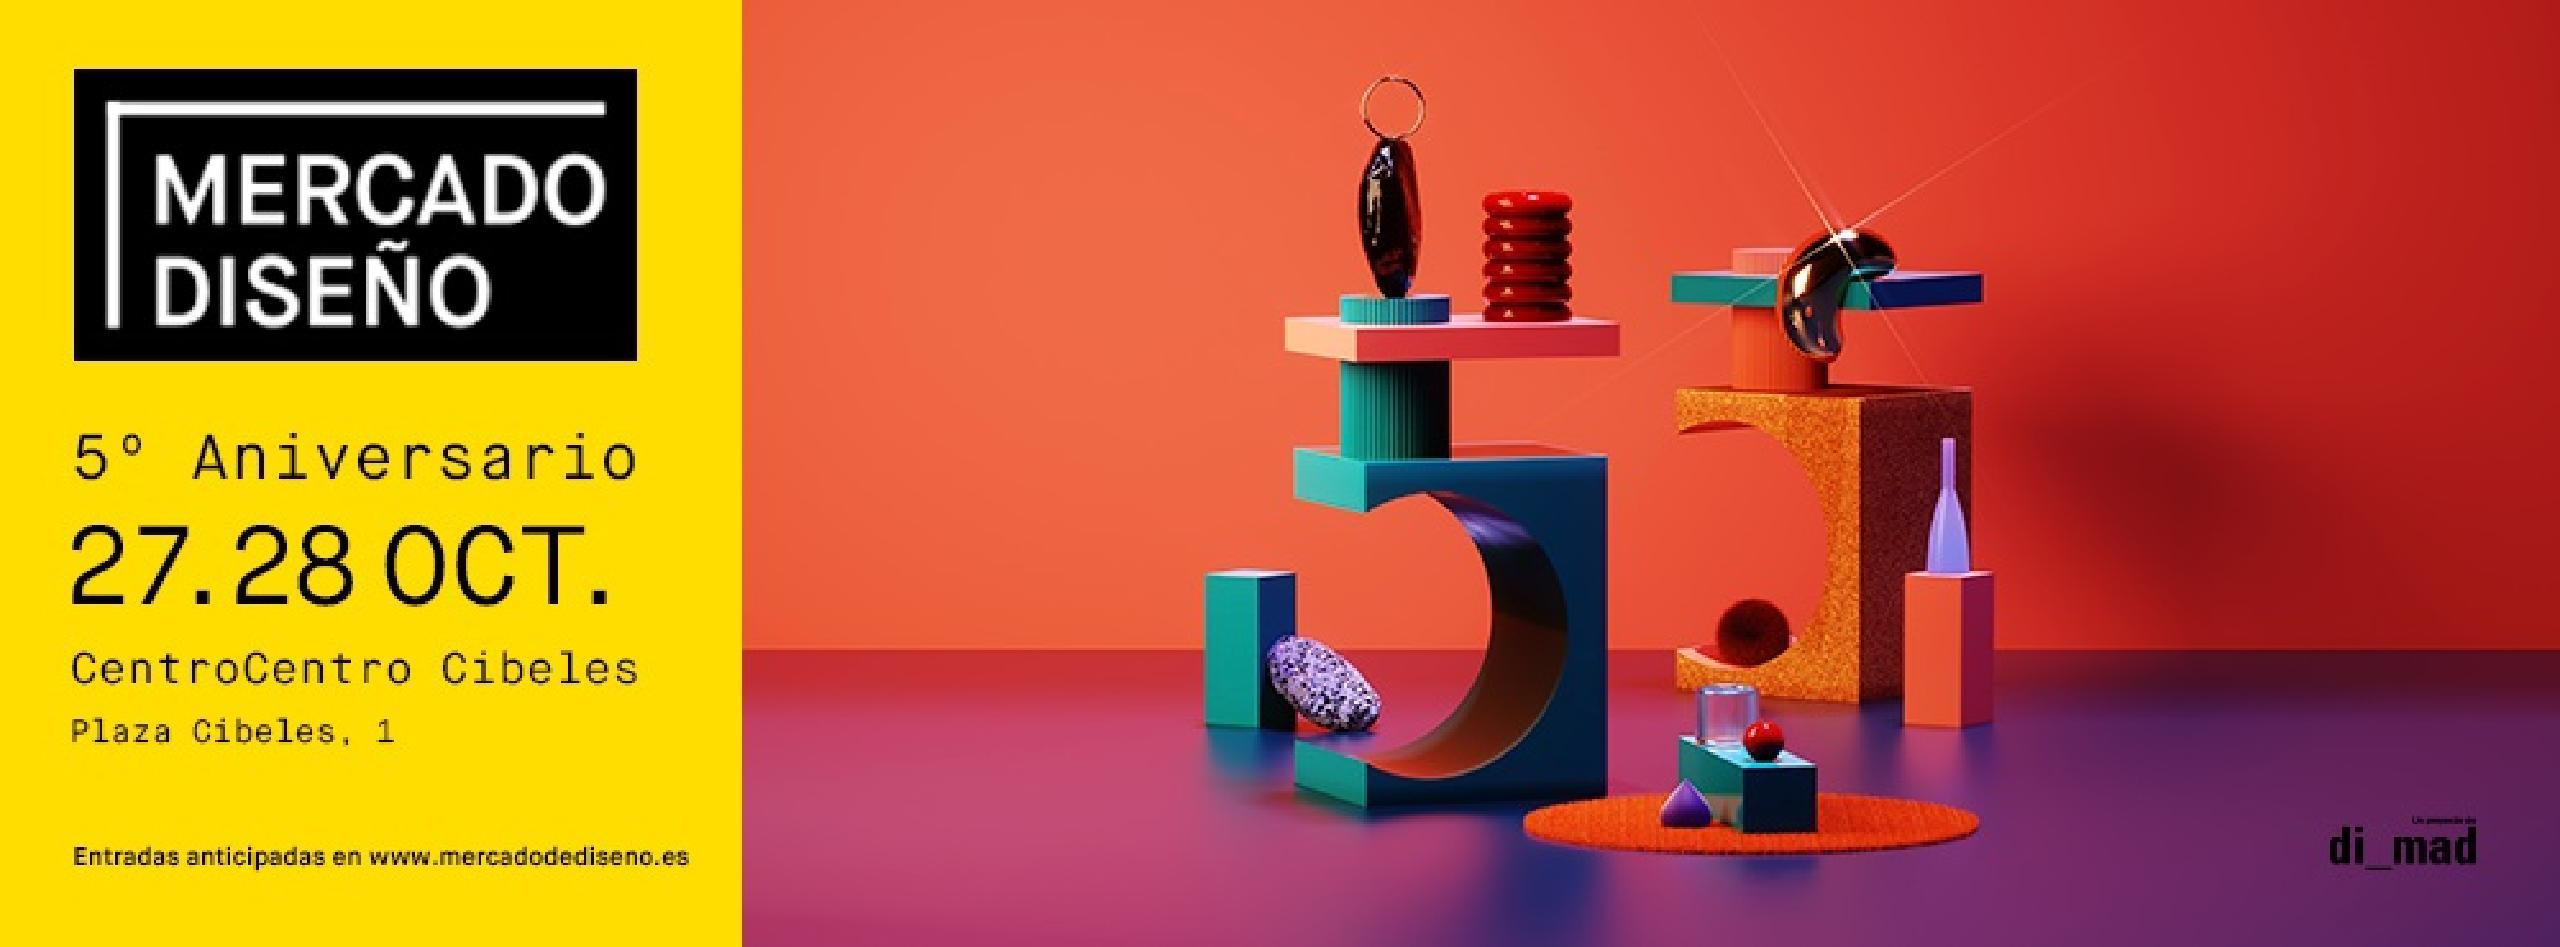 Mercado de Diseño 5º aniversario